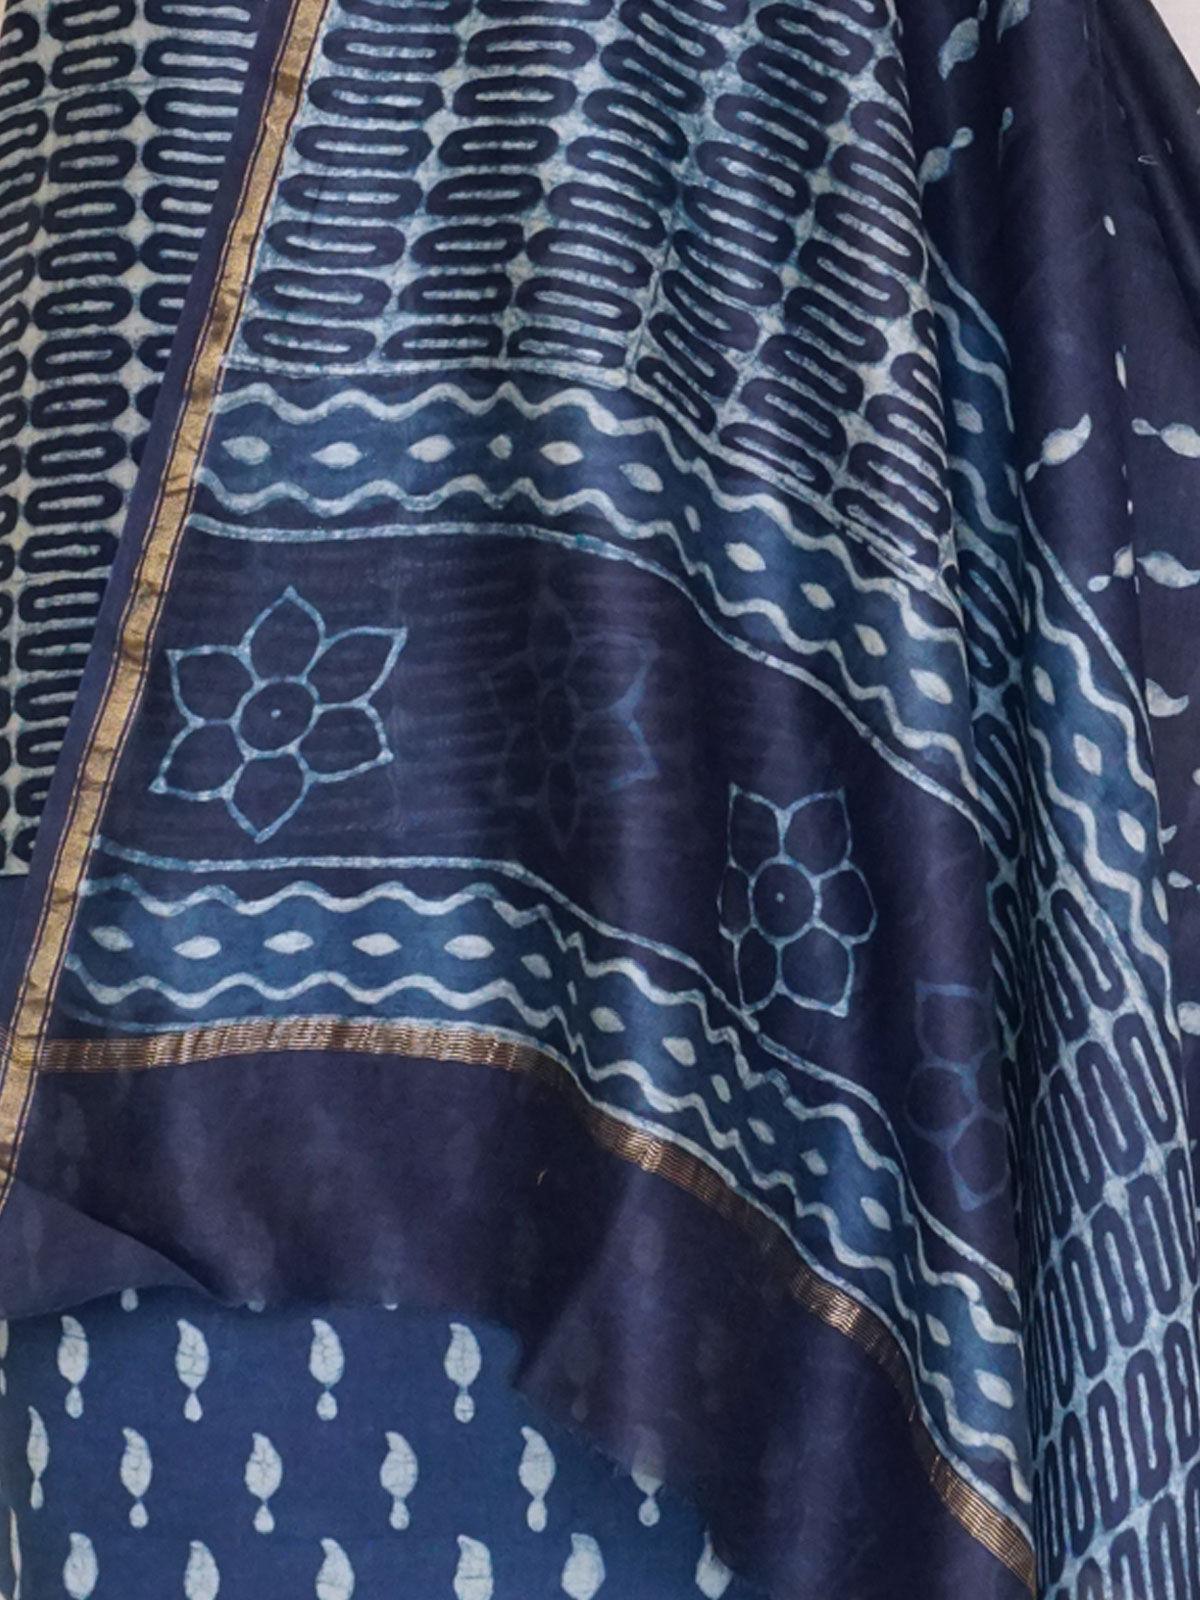 A set of pure indigo chanderi kurta, dupatta and cotton bottom.